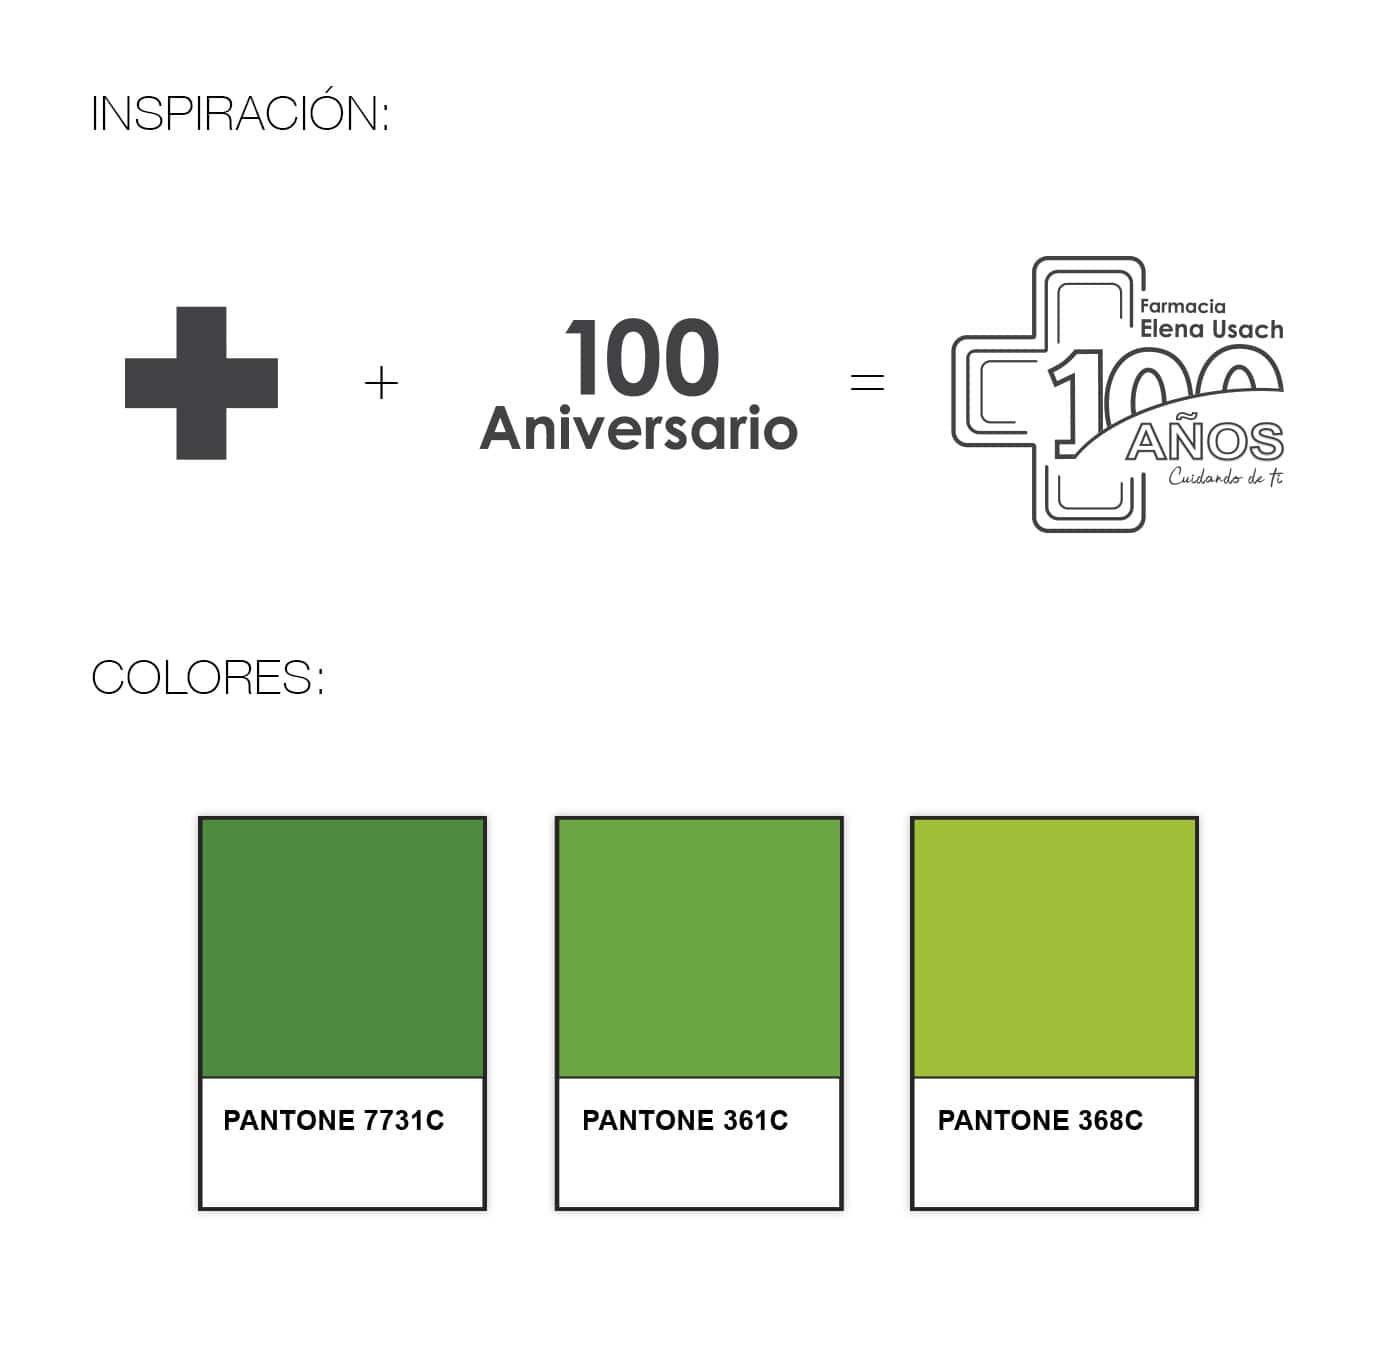 Joan Ibáñez Diseño y Marketing - Logotipos